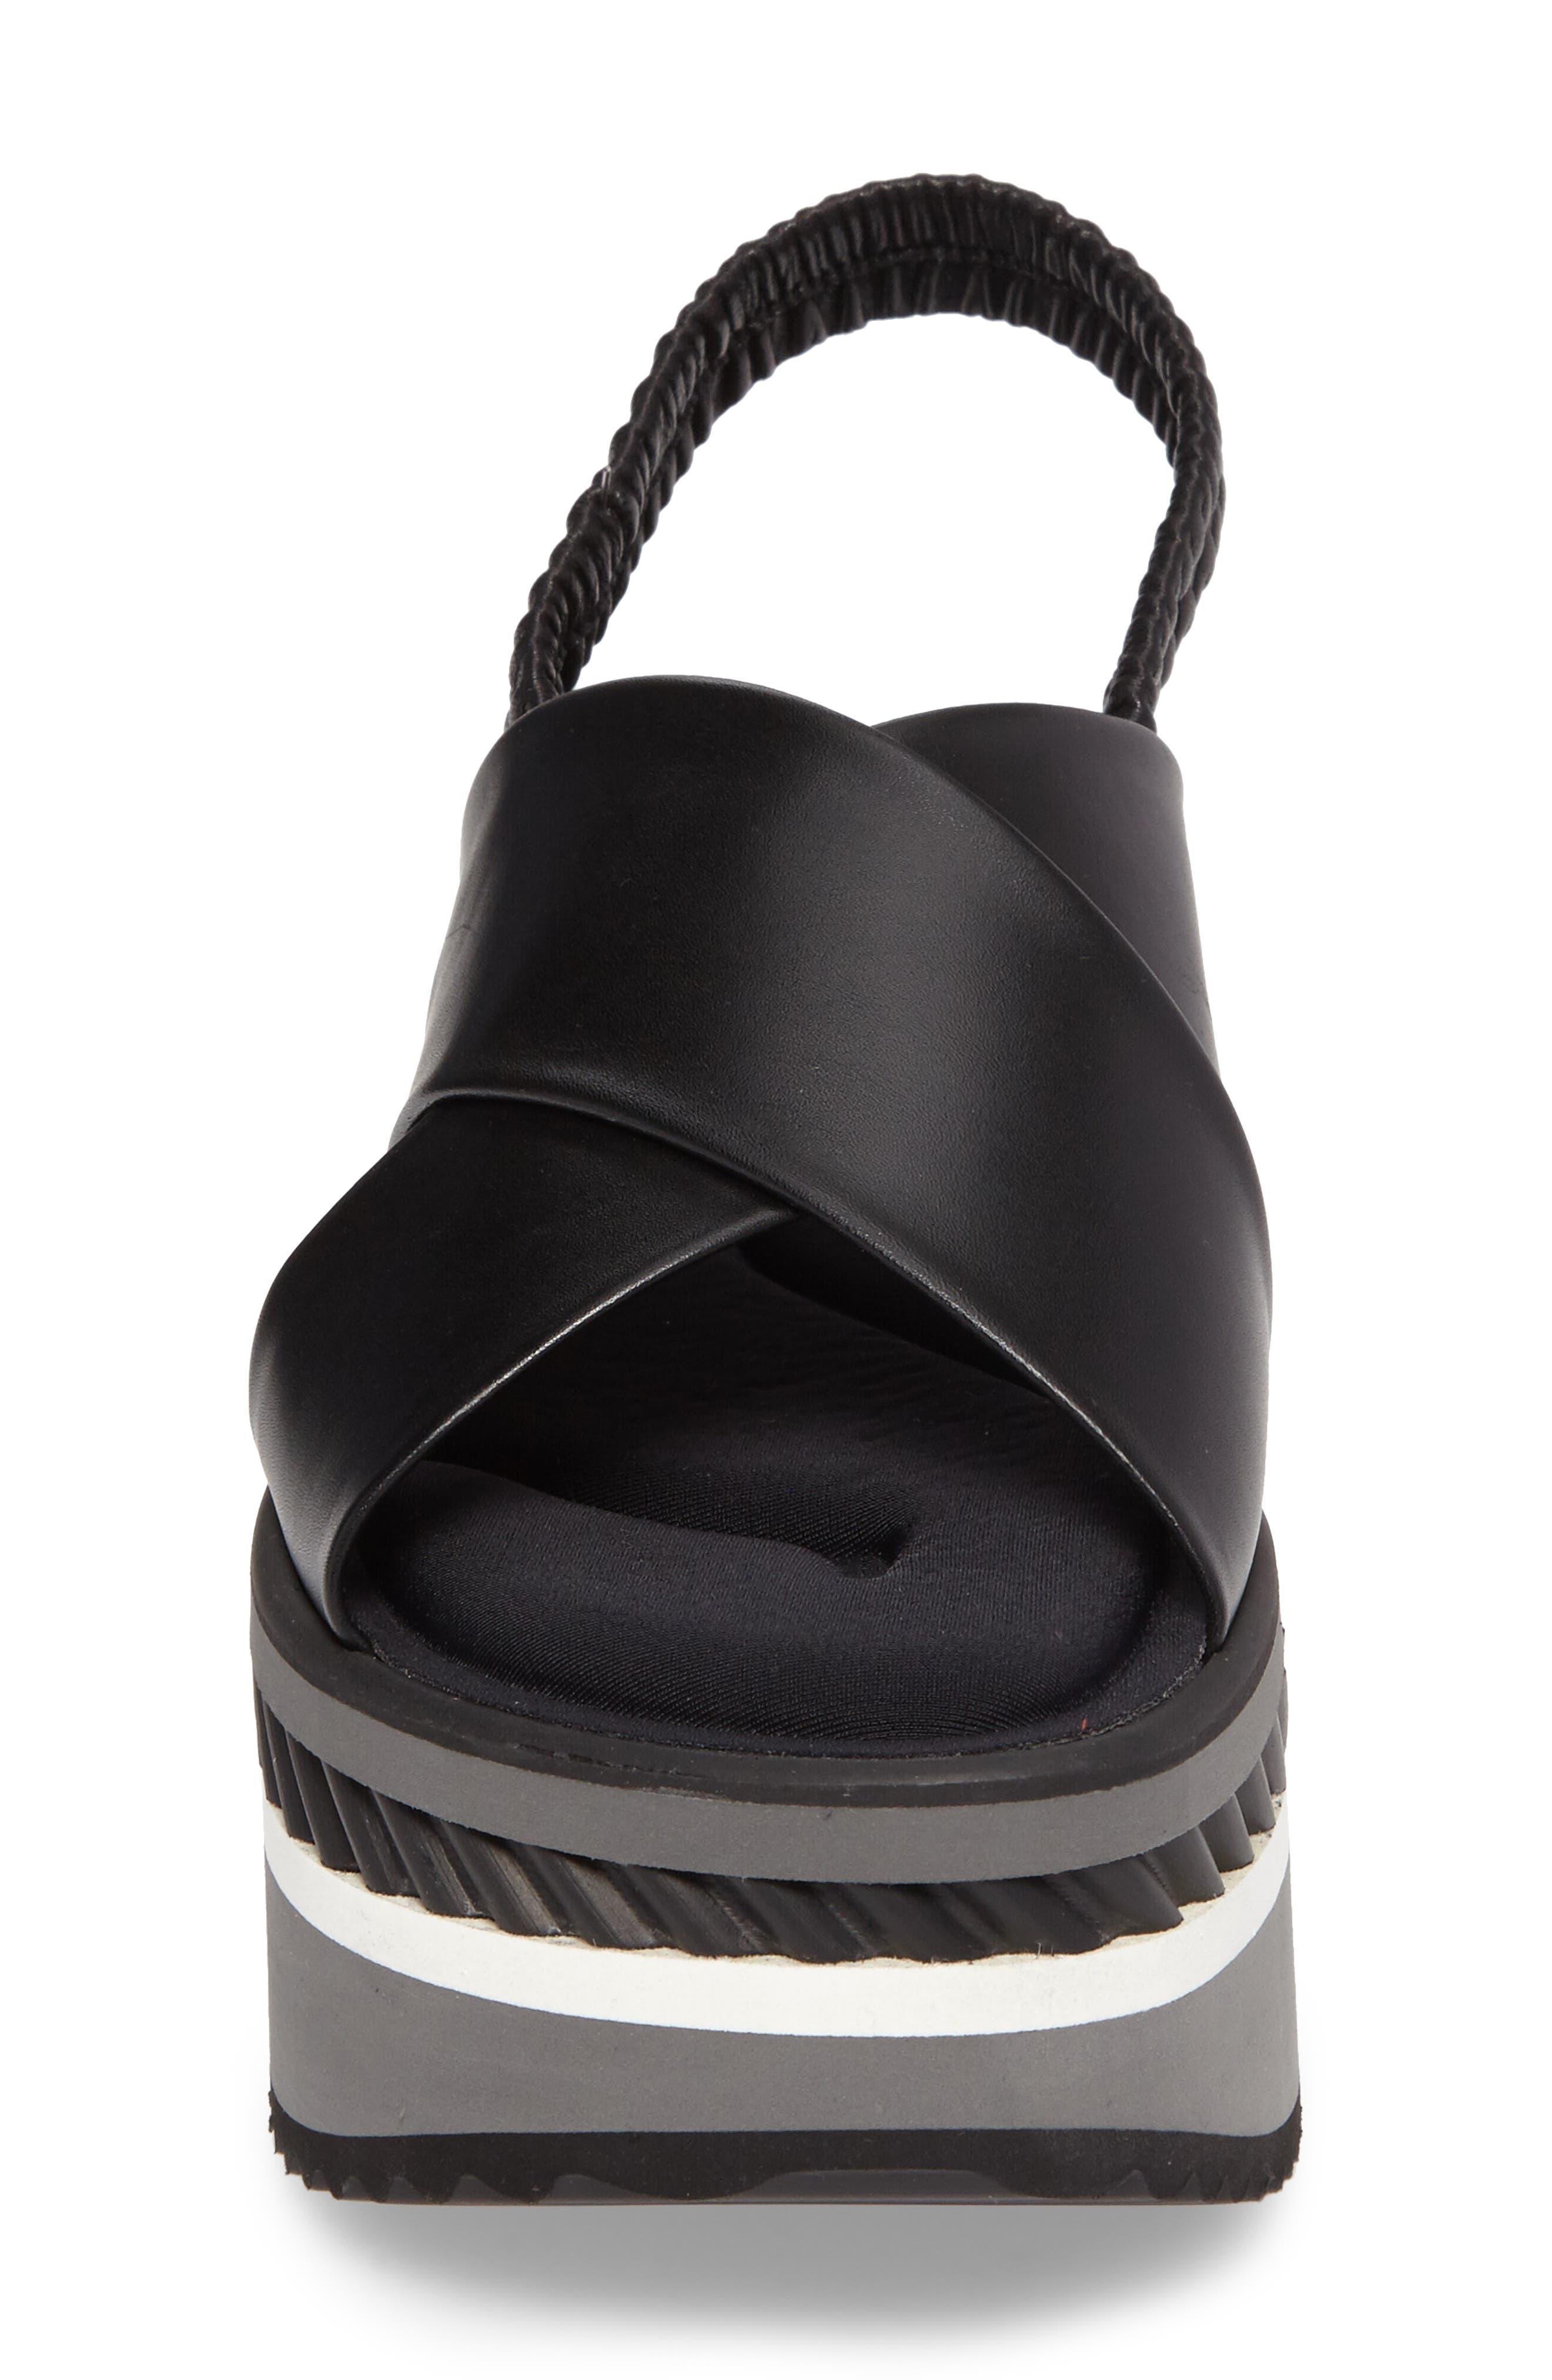 Omin Platform Slingback Sandal,                             Alternate thumbnail 4, color,                             Black